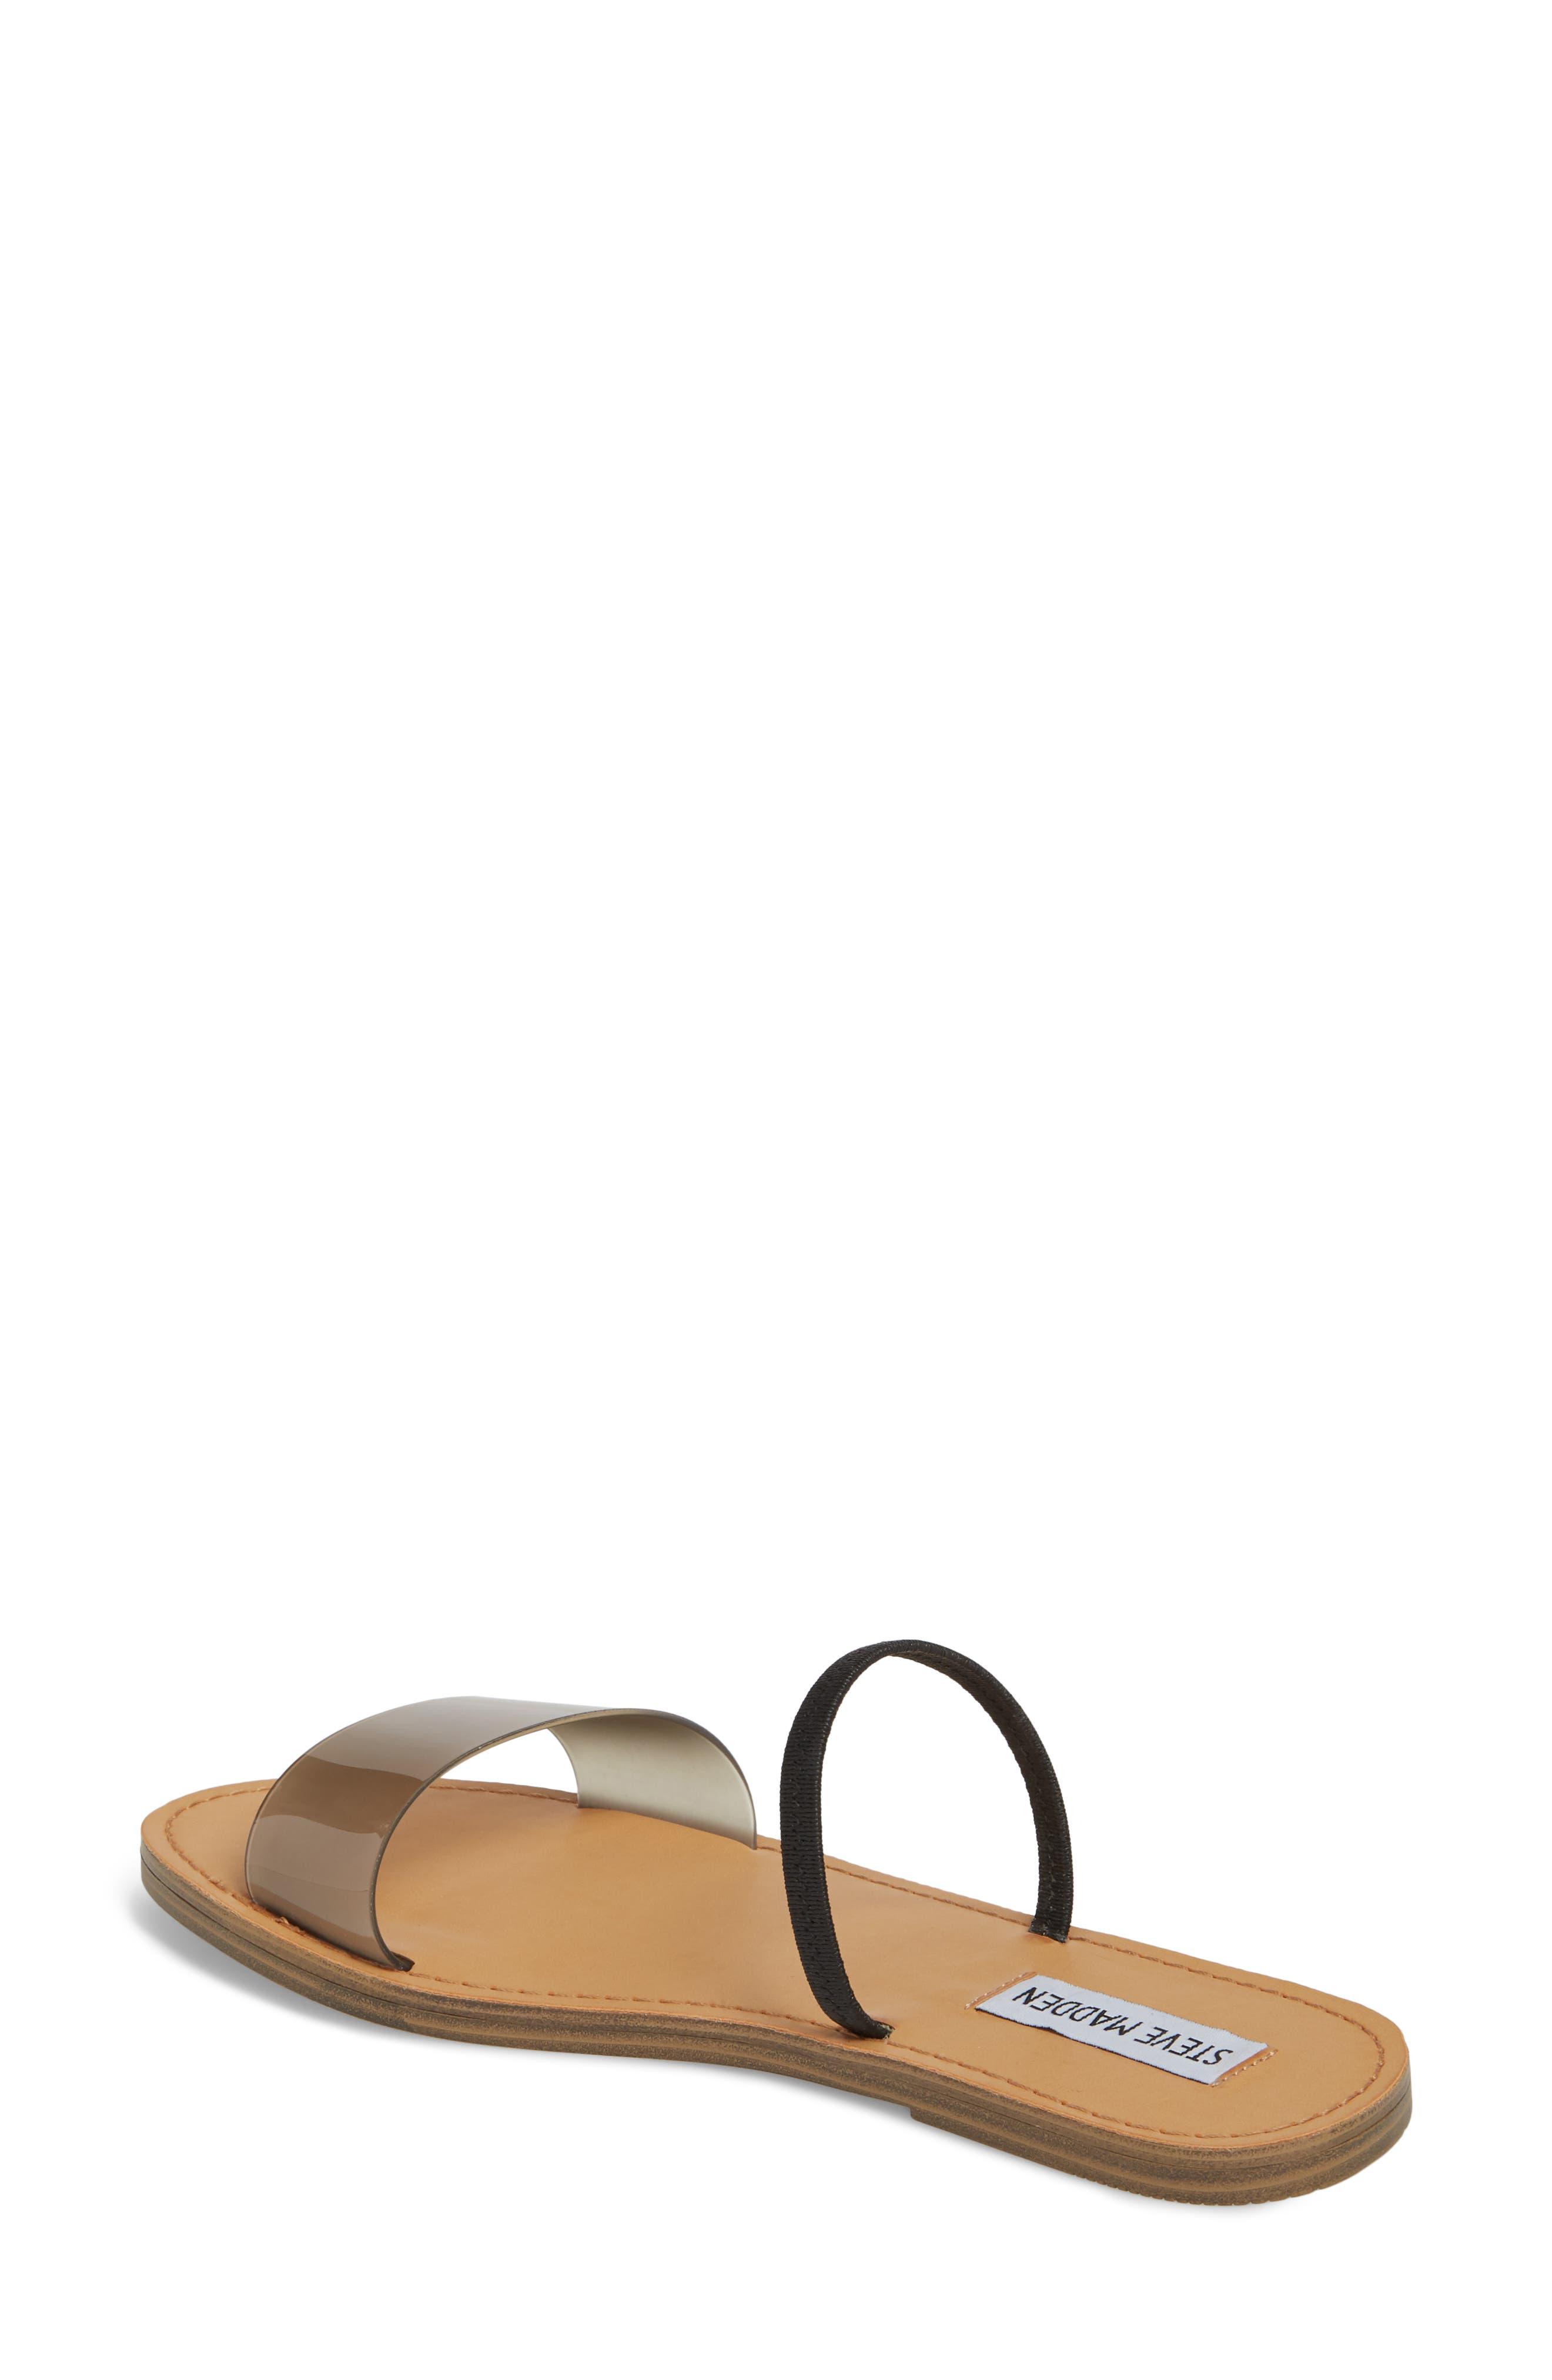 Dasha Strappy Slide Sandal,                             Alternate thumbnail 2, color,                             Smoke